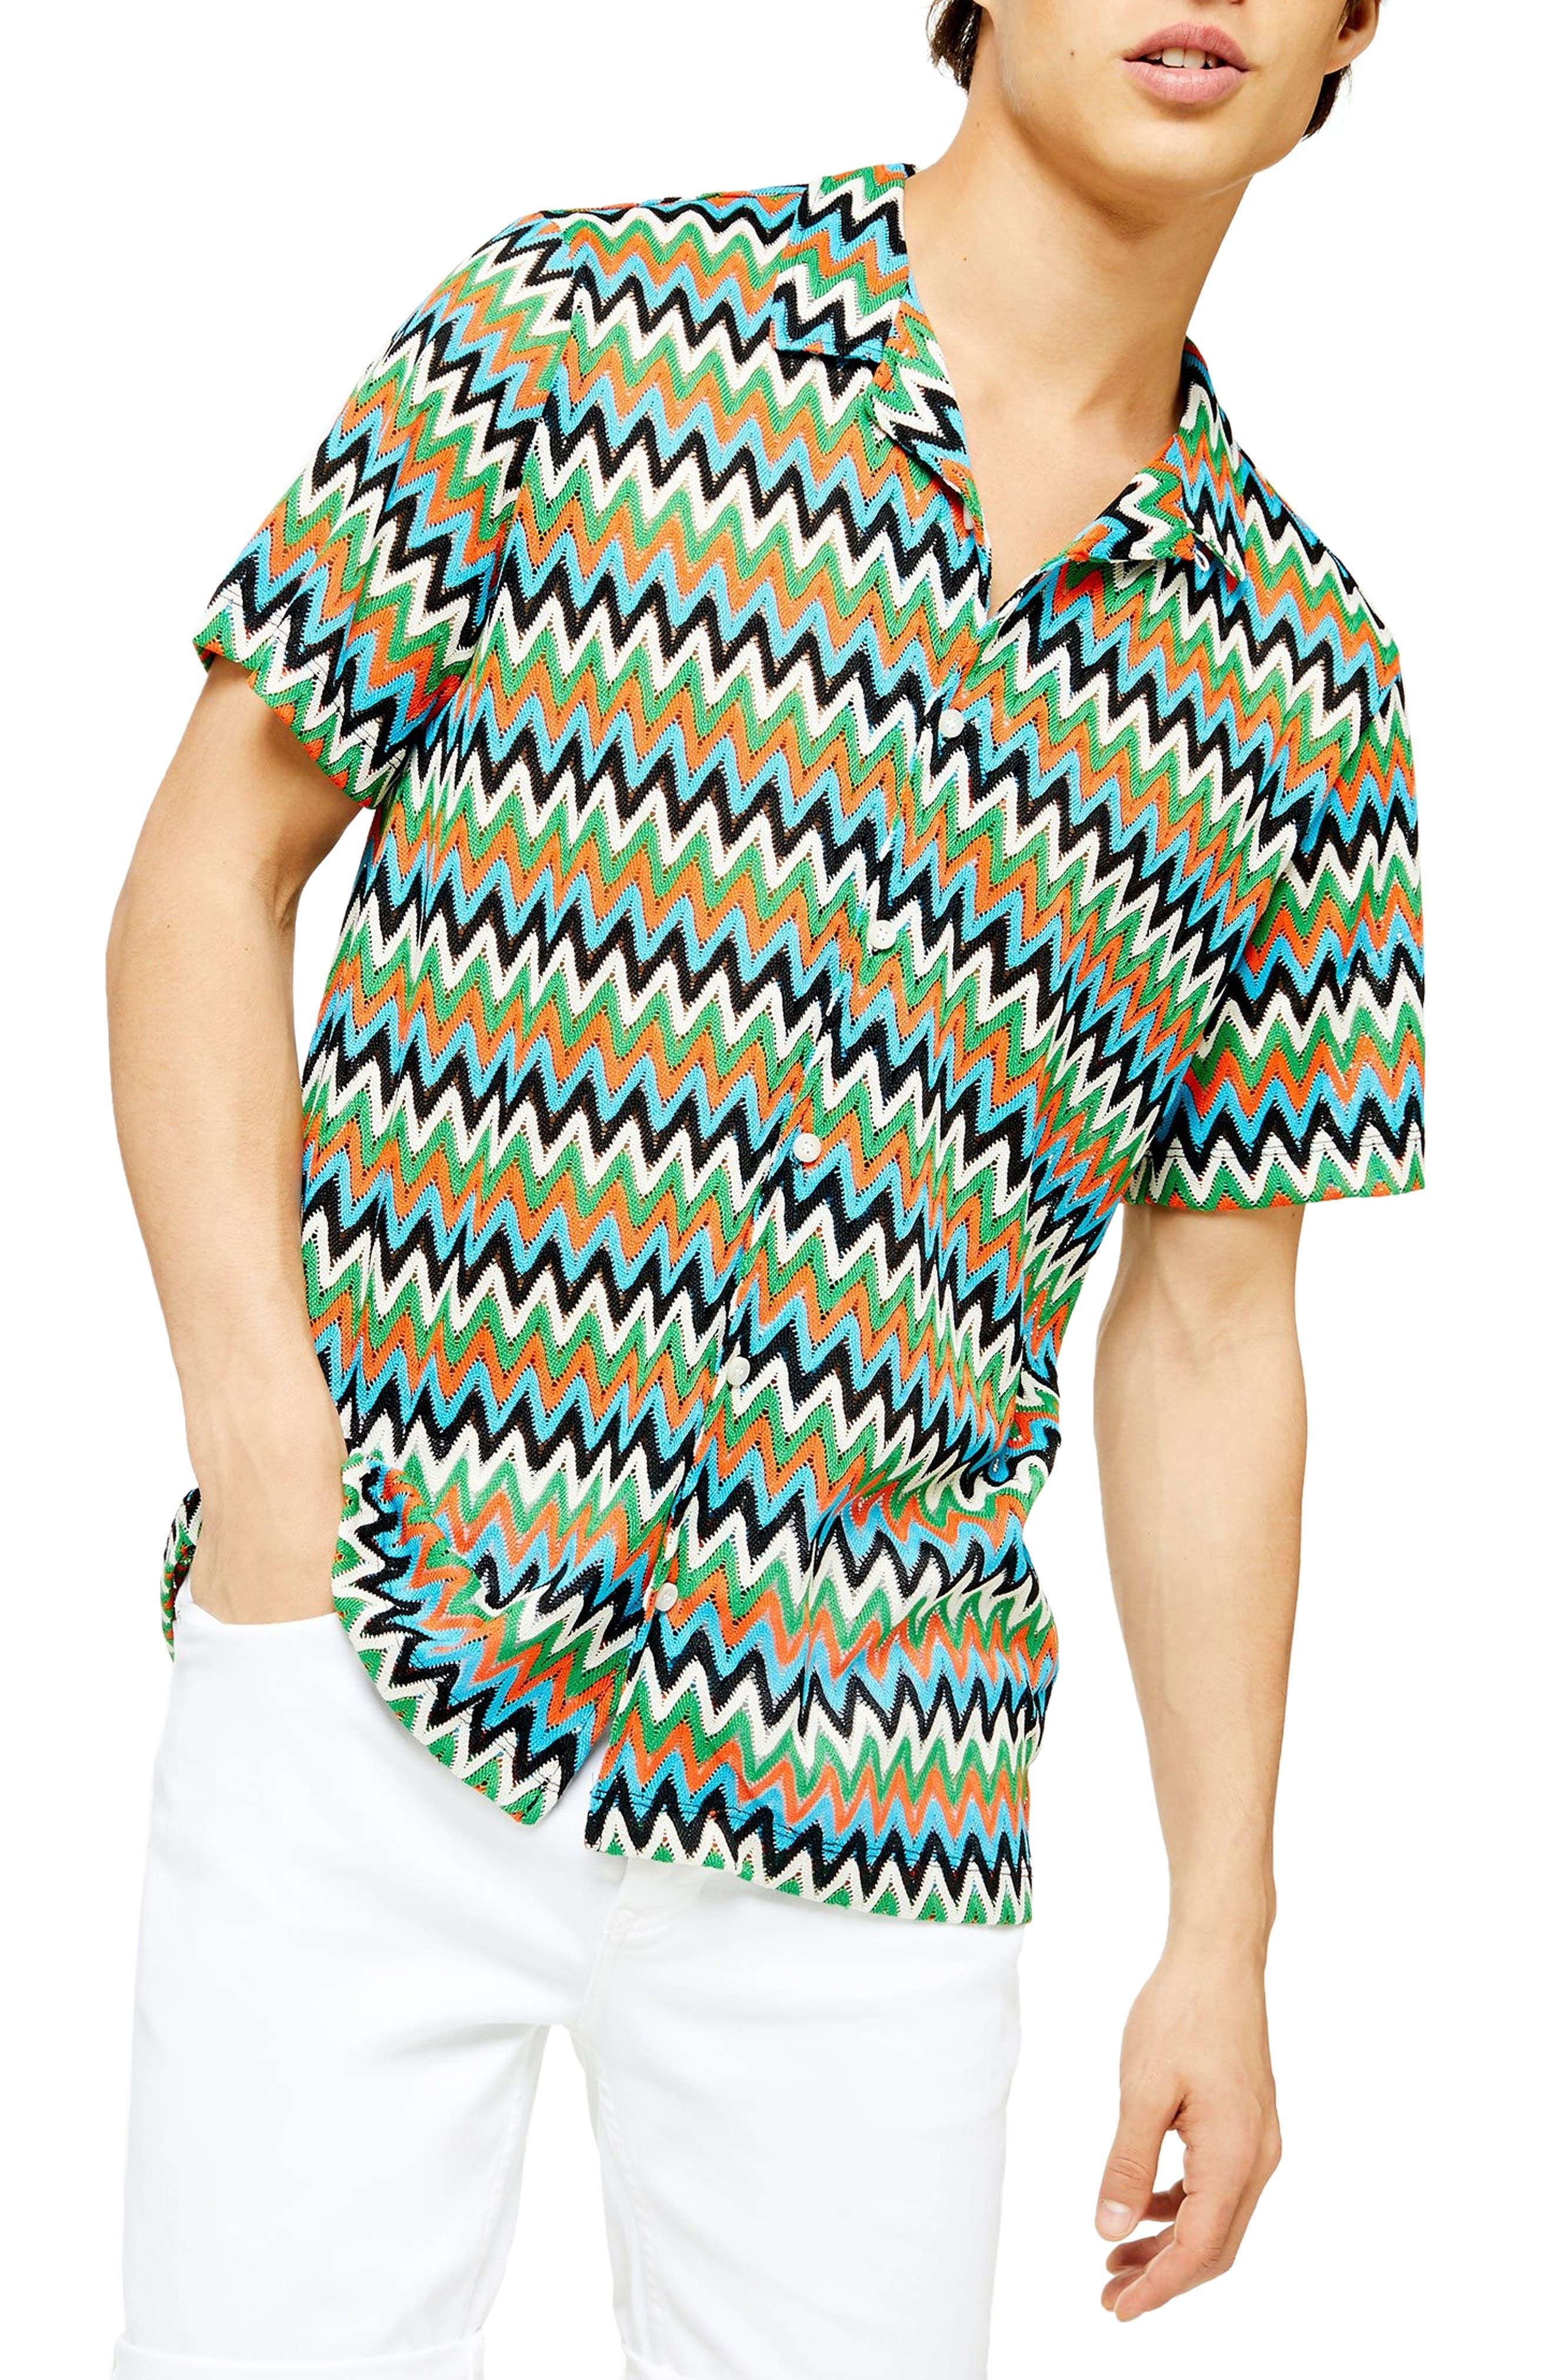 1960s -1970s Men's Clothing Mens Topman Chevron Short Sleeve Button-Up Knit Camp Shirt $70.00 AT vintagedancer.com